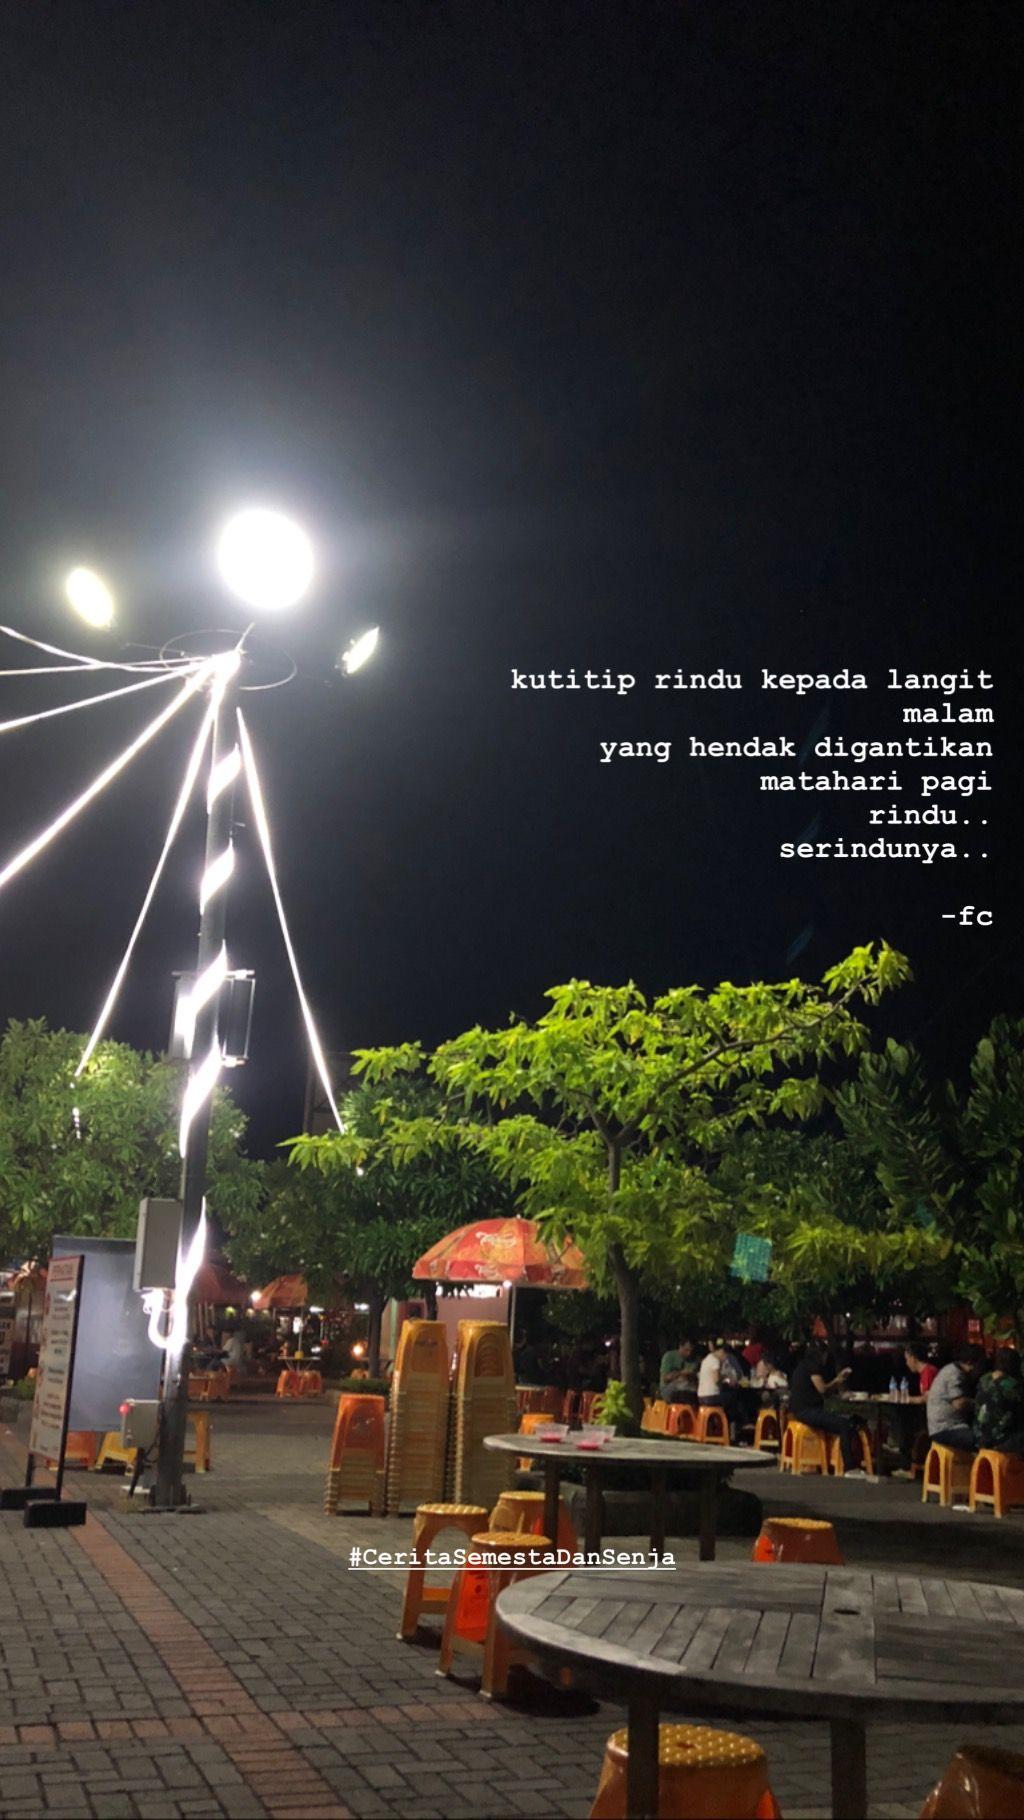 Ceritasemestadansenja Indonesia Quotes Cerita Semesta Dan Senja